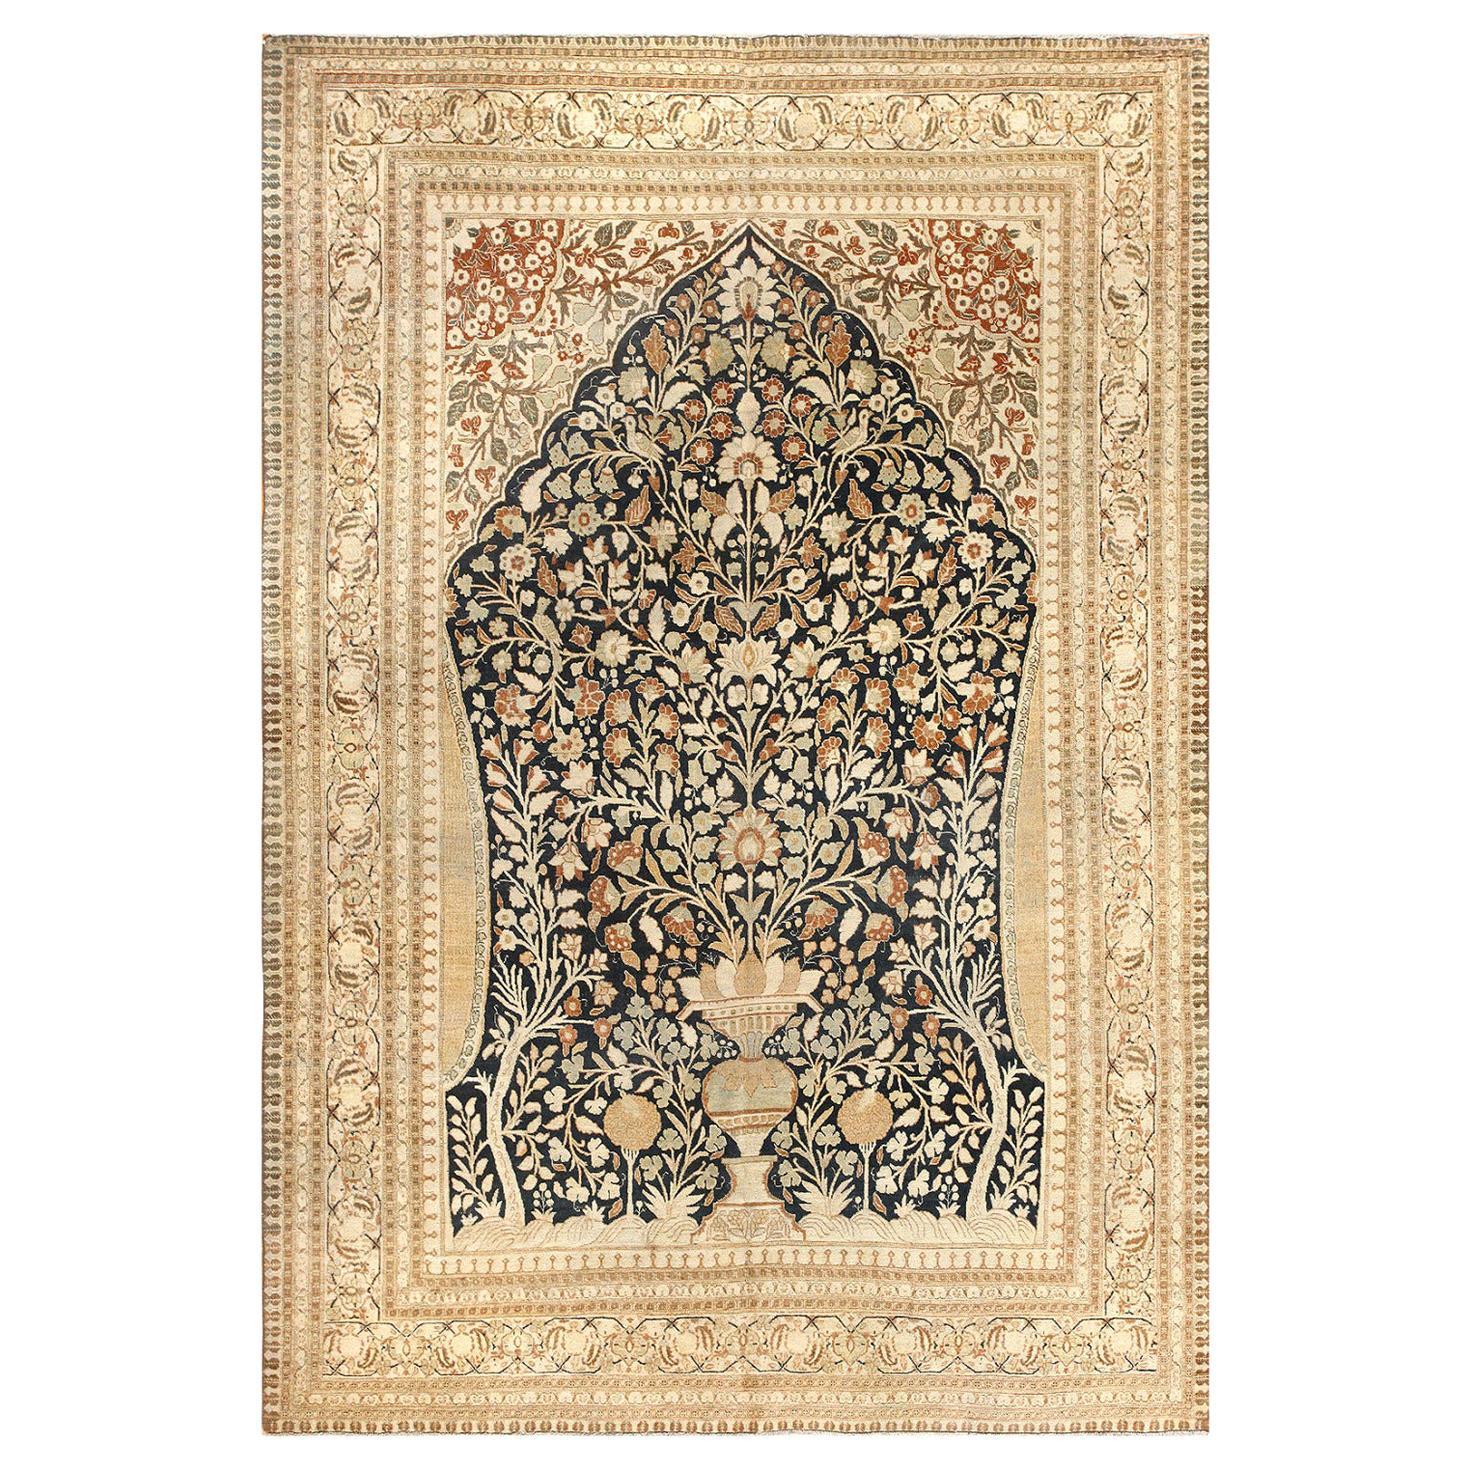 Antique Haji Jalili Tabriz Tree of Life Carpet. Size: 6 ft 9 in x 10 ft